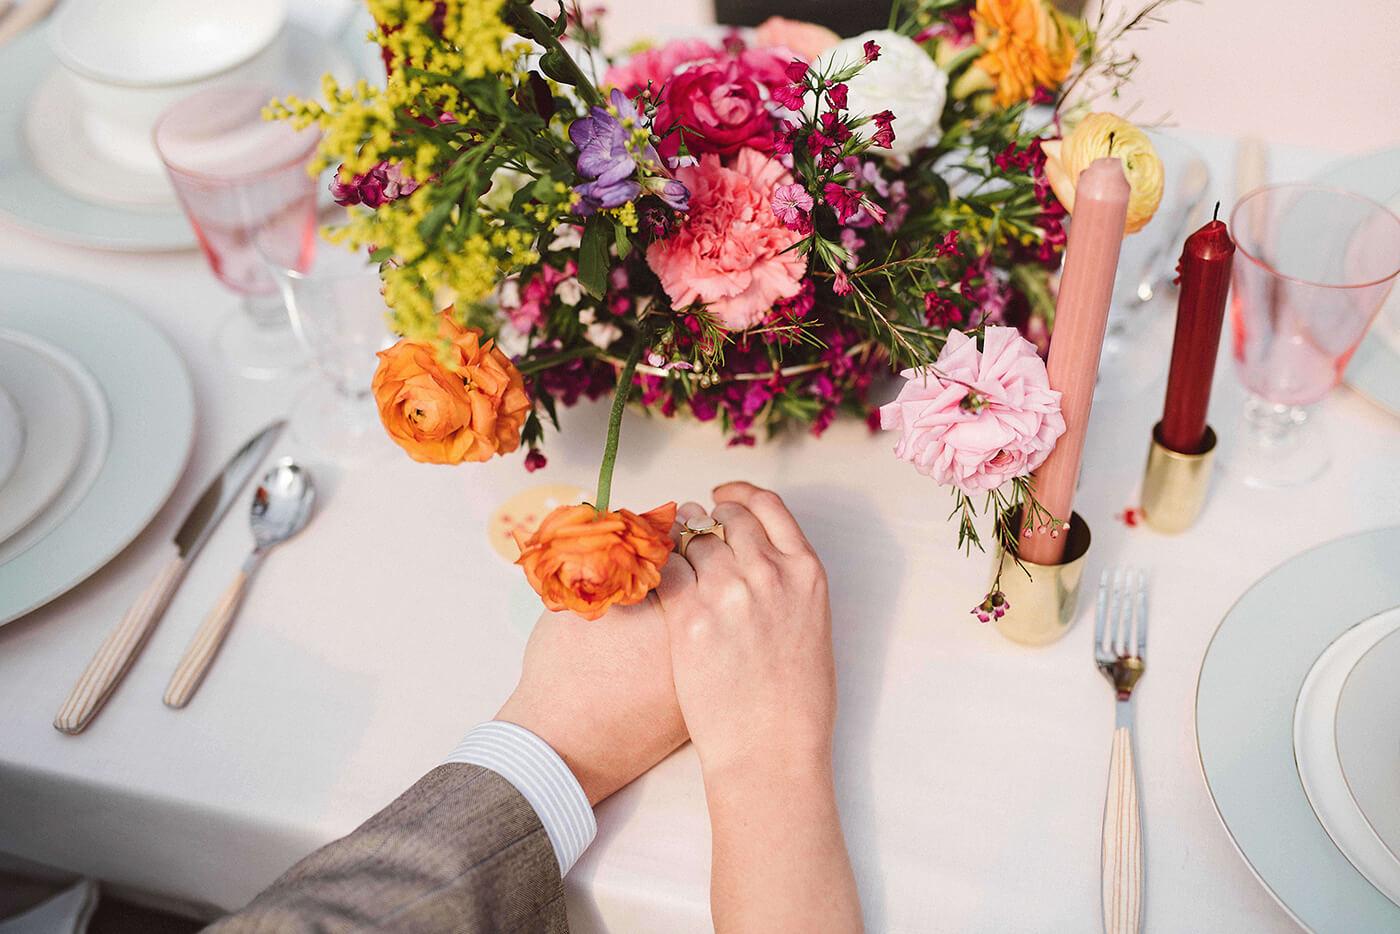 roma-organizacao-eventos-editorial-mid-century-modern-wedding-in-a-strawberry-field-21